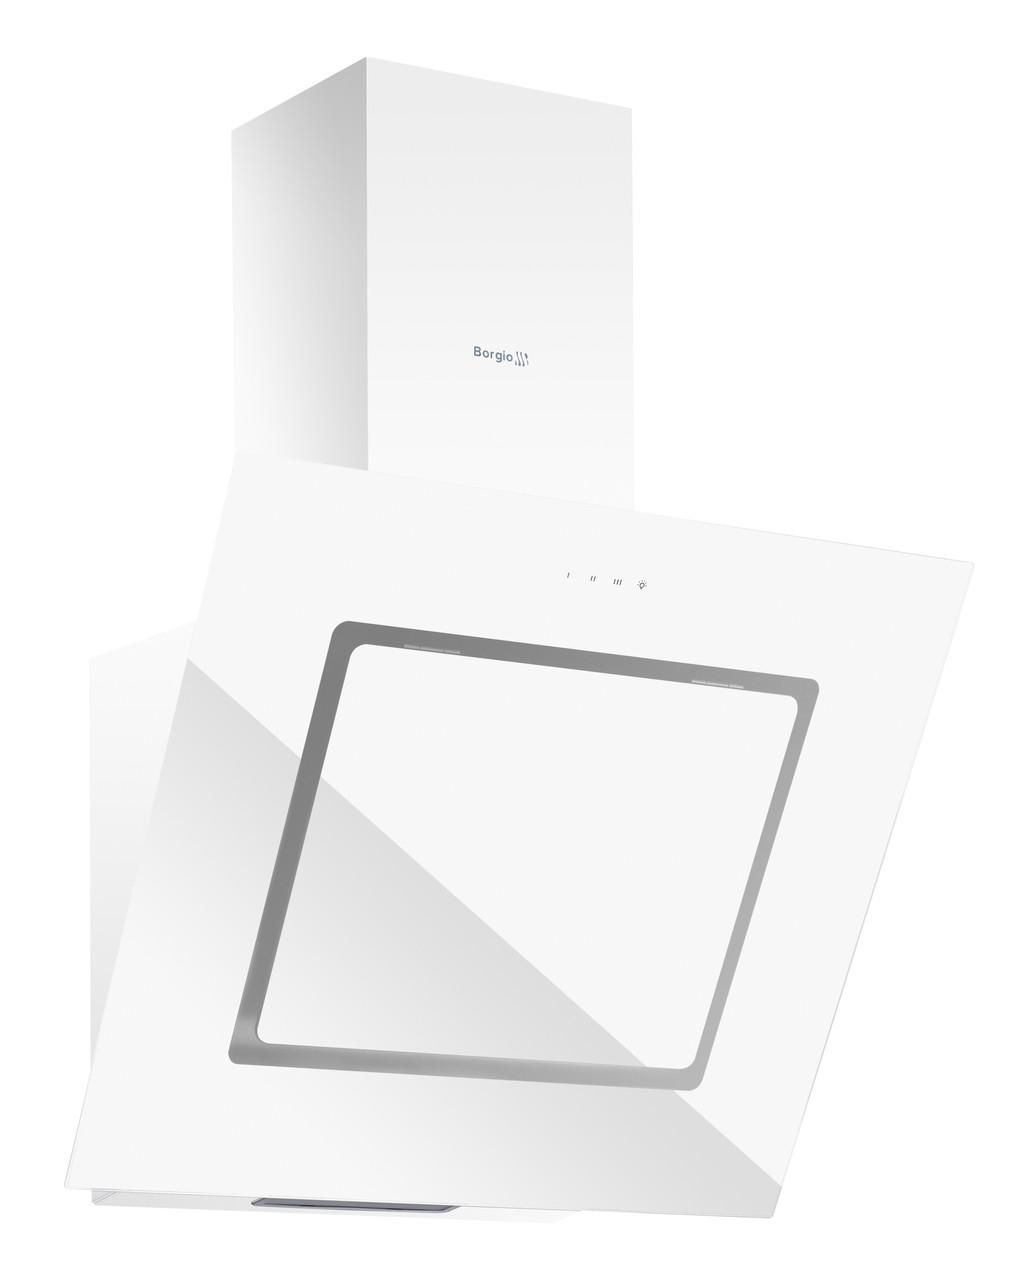 Кухонна витяжка BORGIO RNT-F 60white MU (850 м/куб)